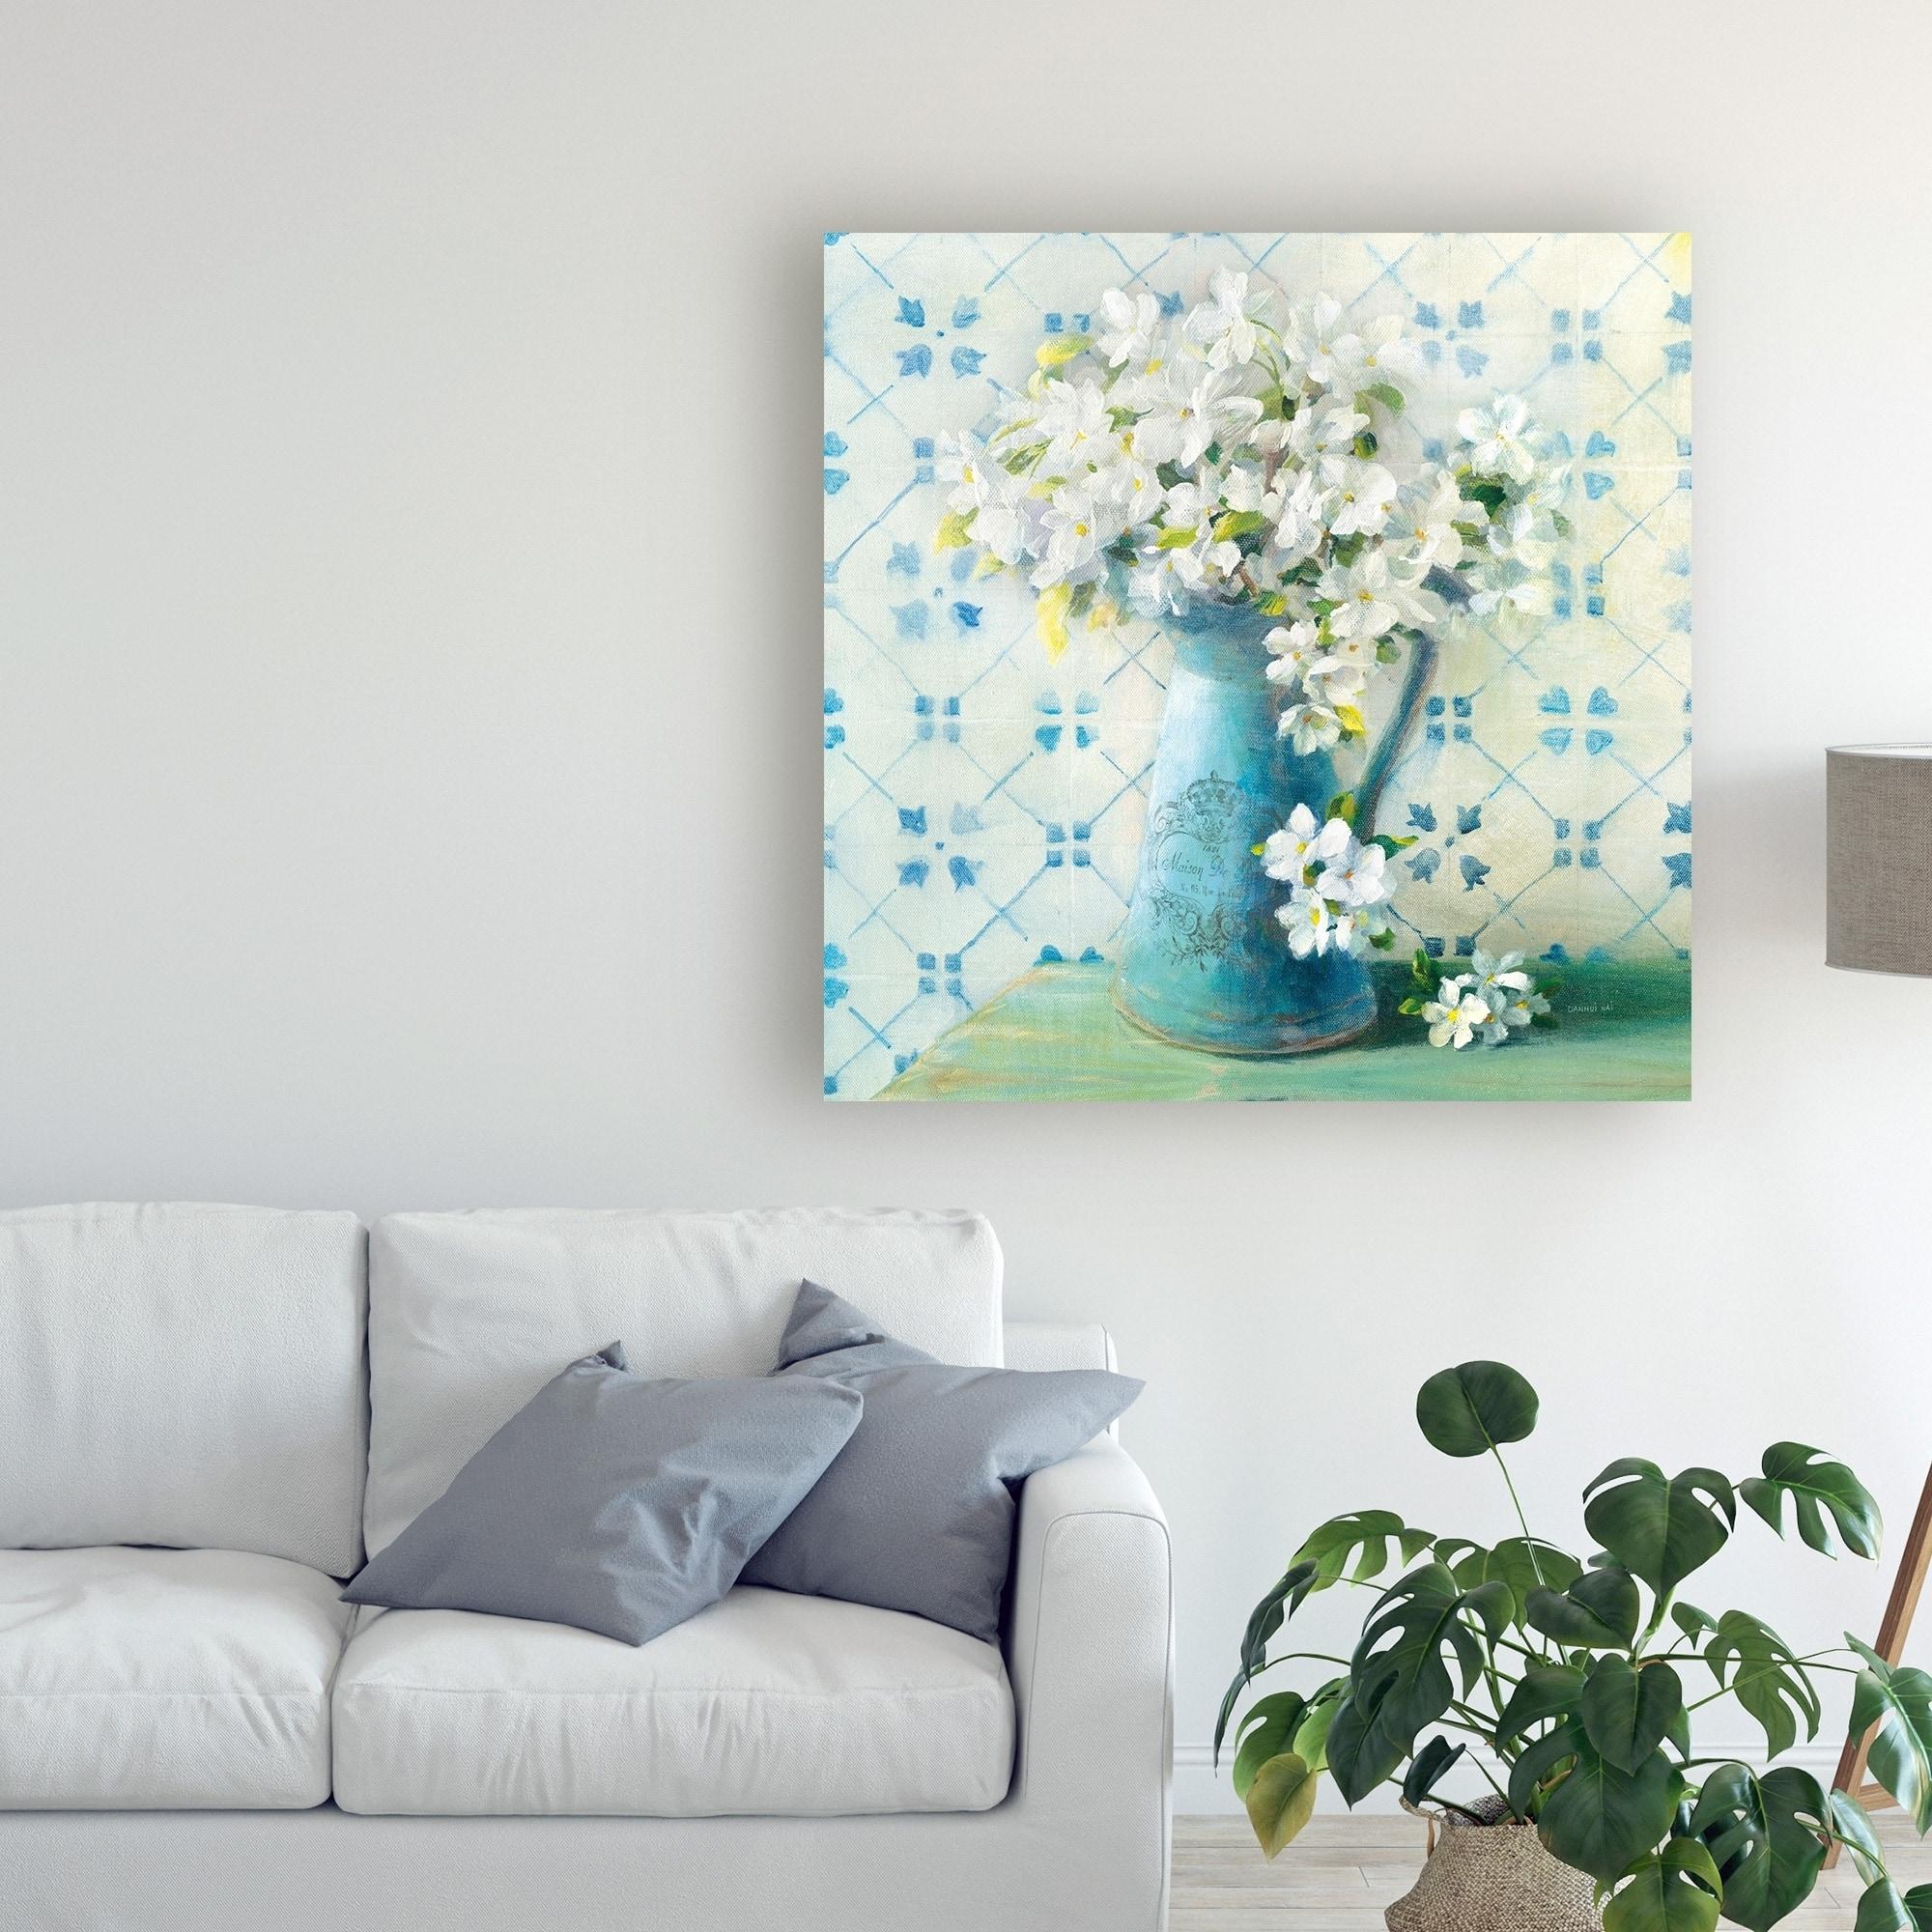 Danhui Nai May Blossoms Ii Crop Canvas Art Overstock 26274910